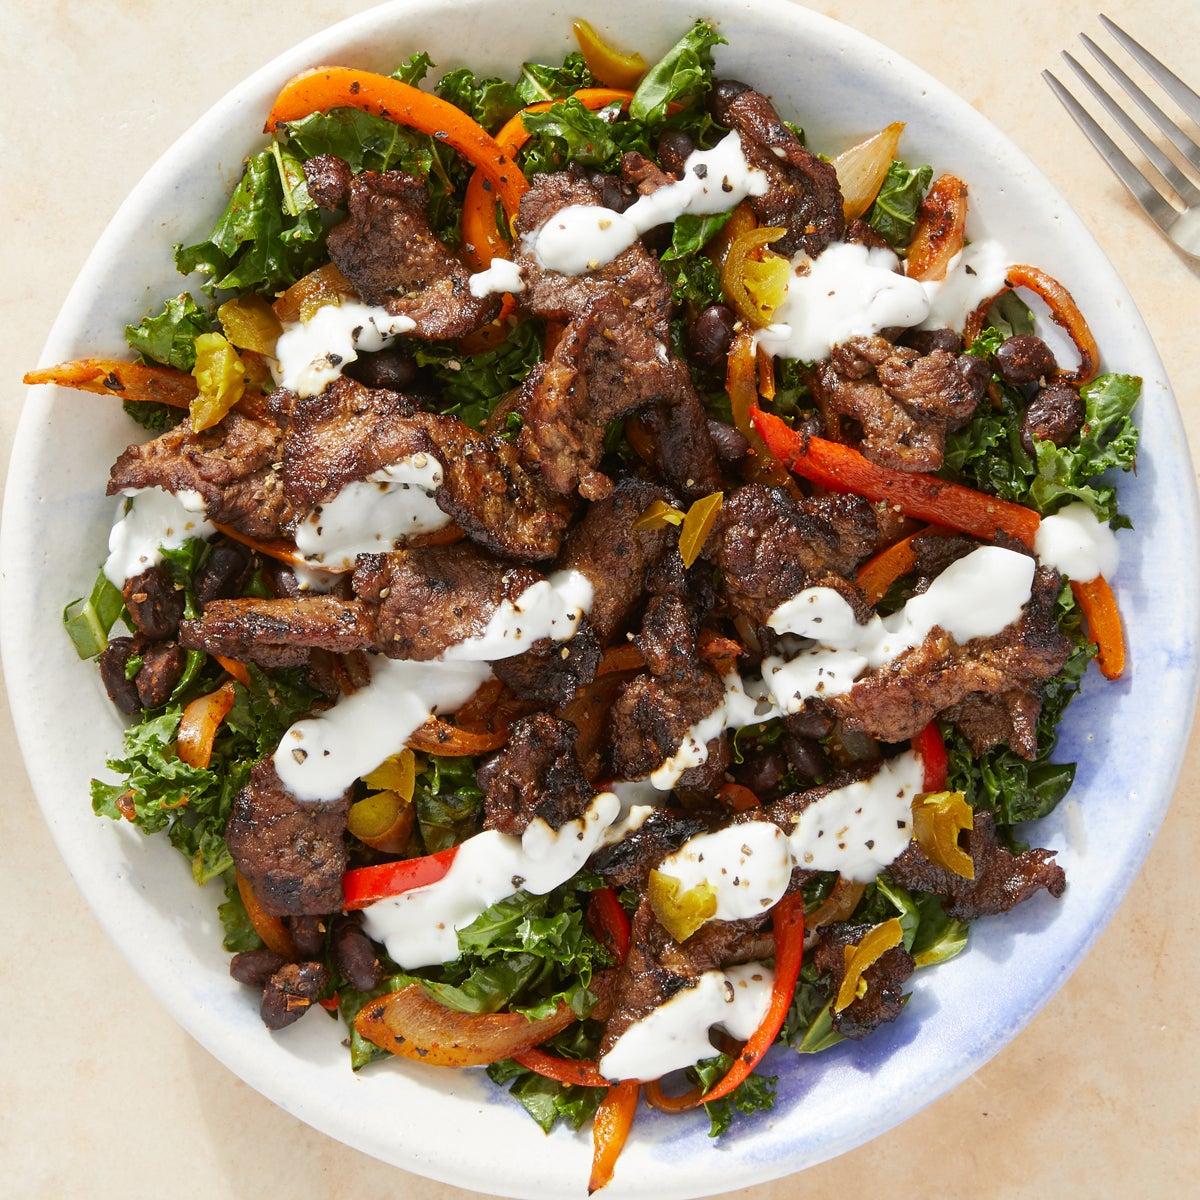 Beef & Black Bean Fajita Salad with Kale & Yogurt Dressing